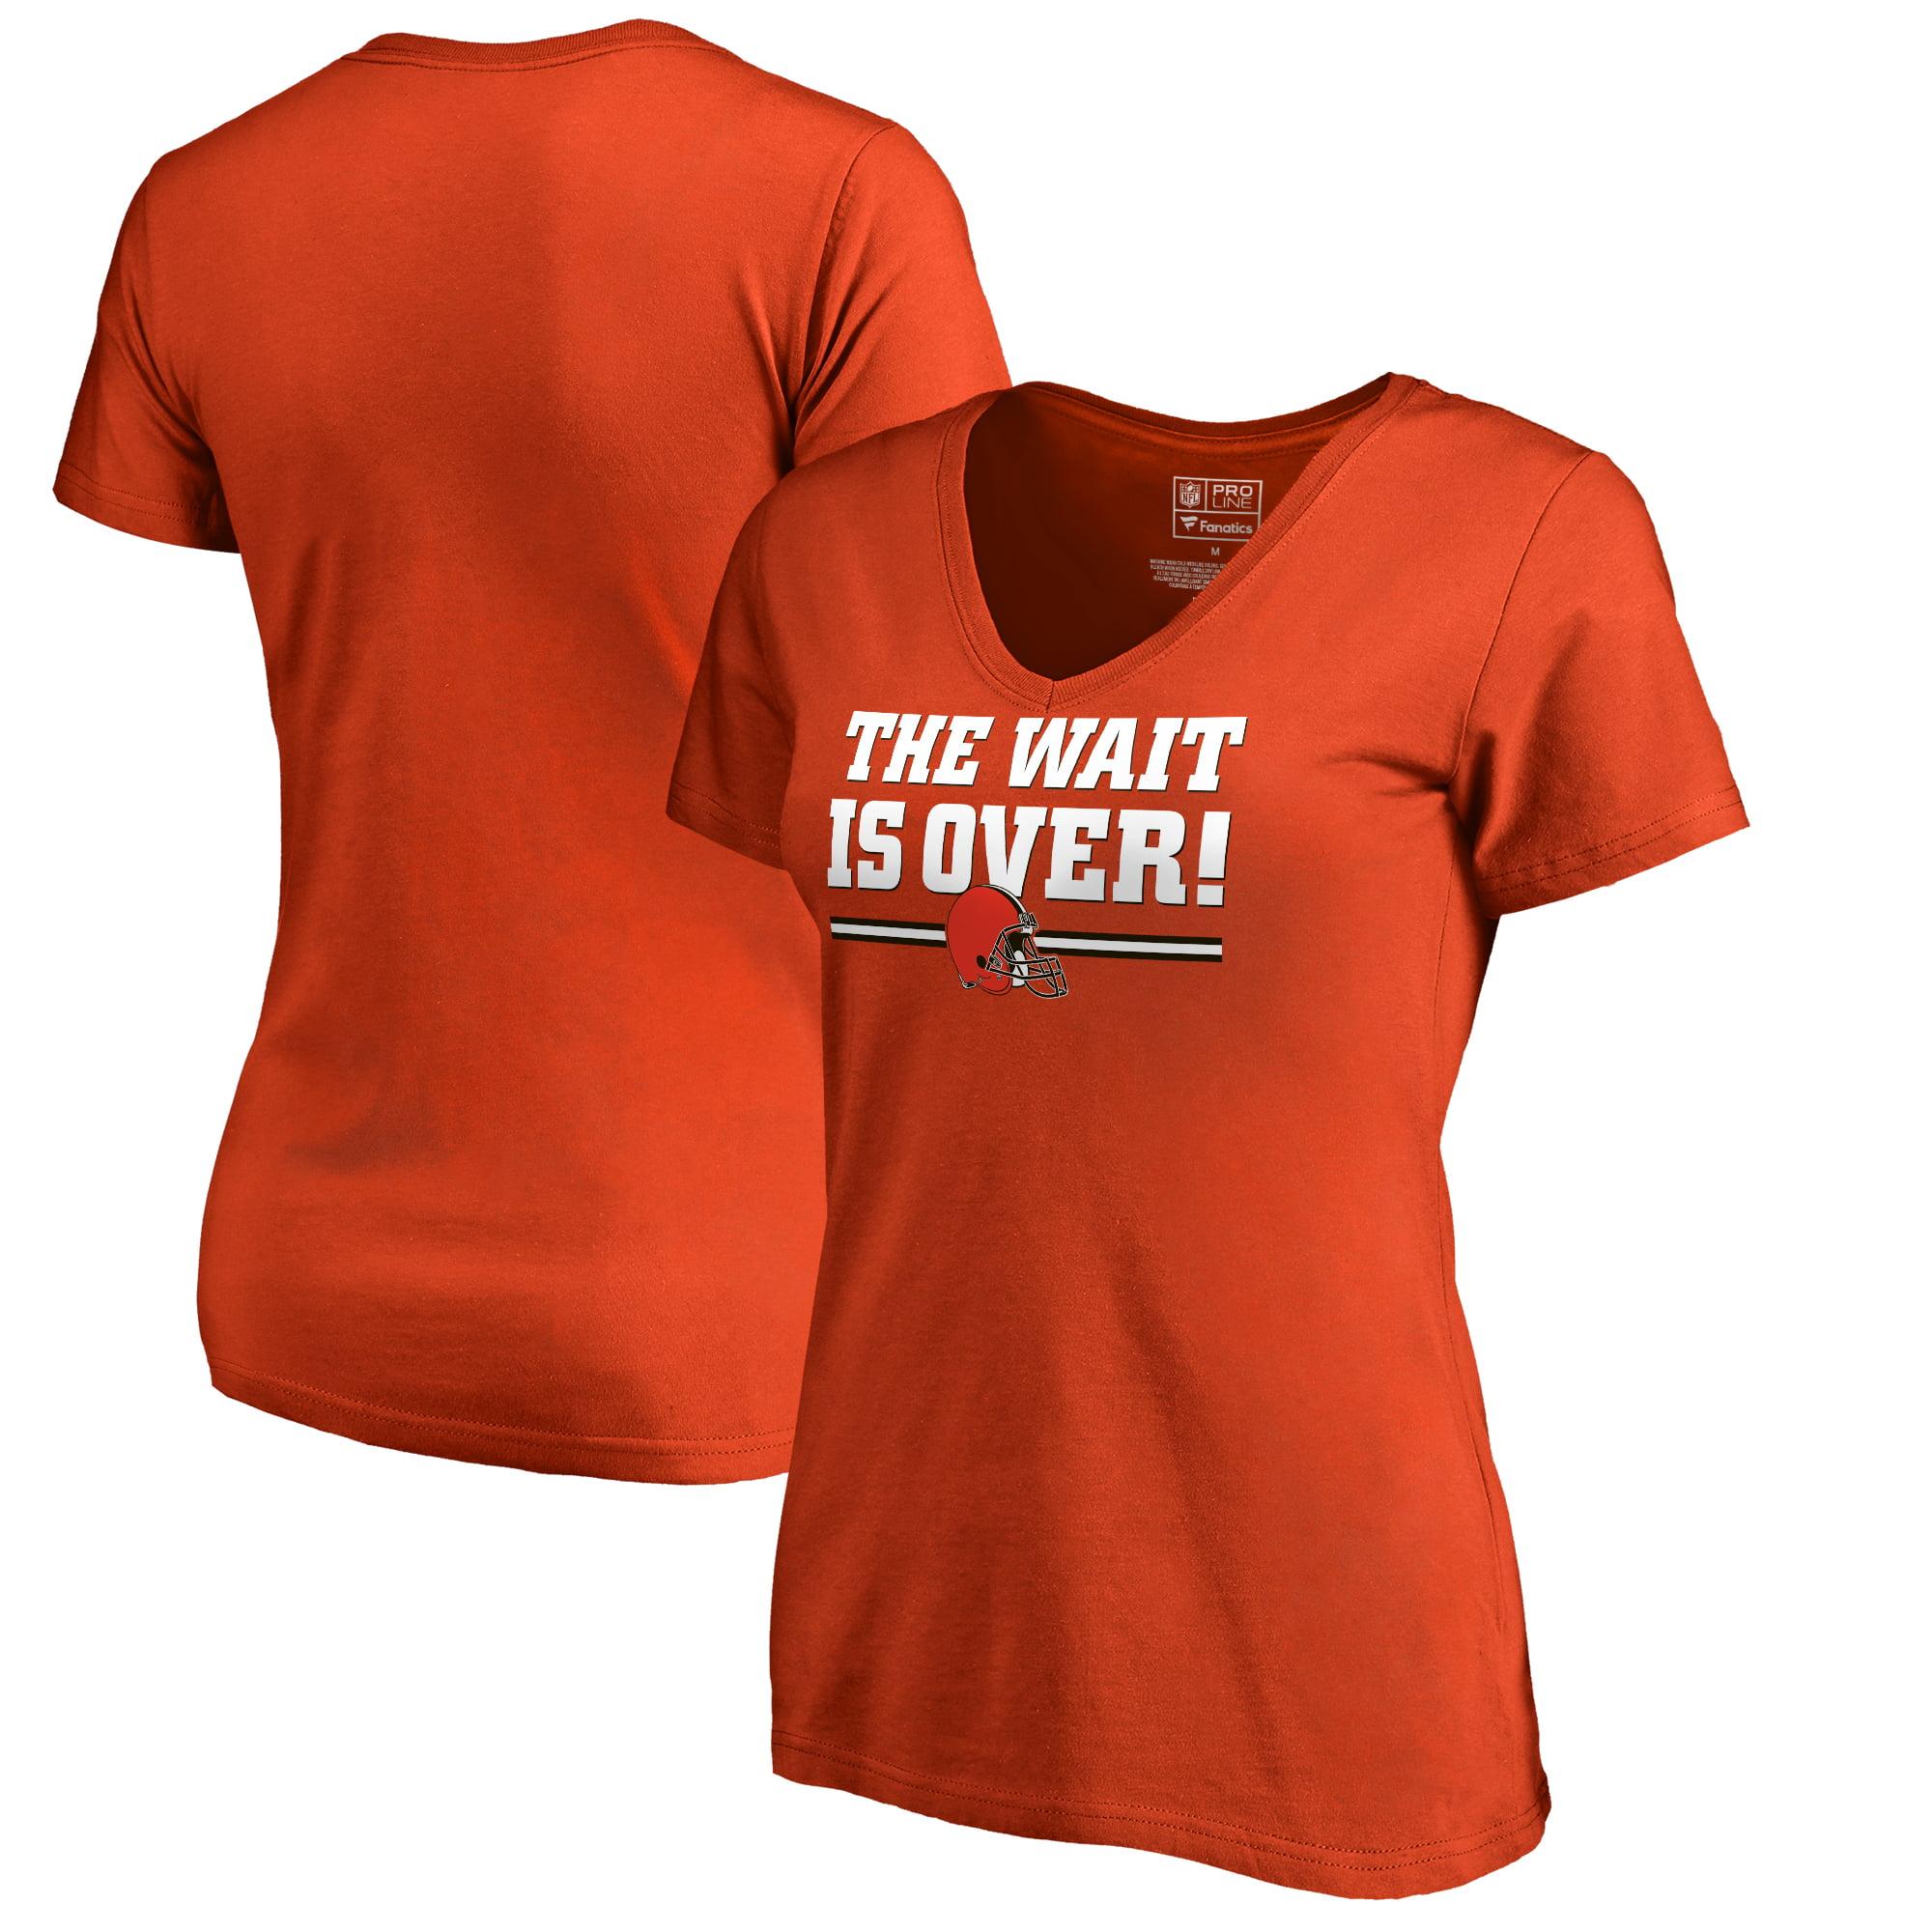 Cleveland Browns NFL Pro Line by Fanatics Branded Women's The Wait Is Over V-Neck T-Shirt - Orange